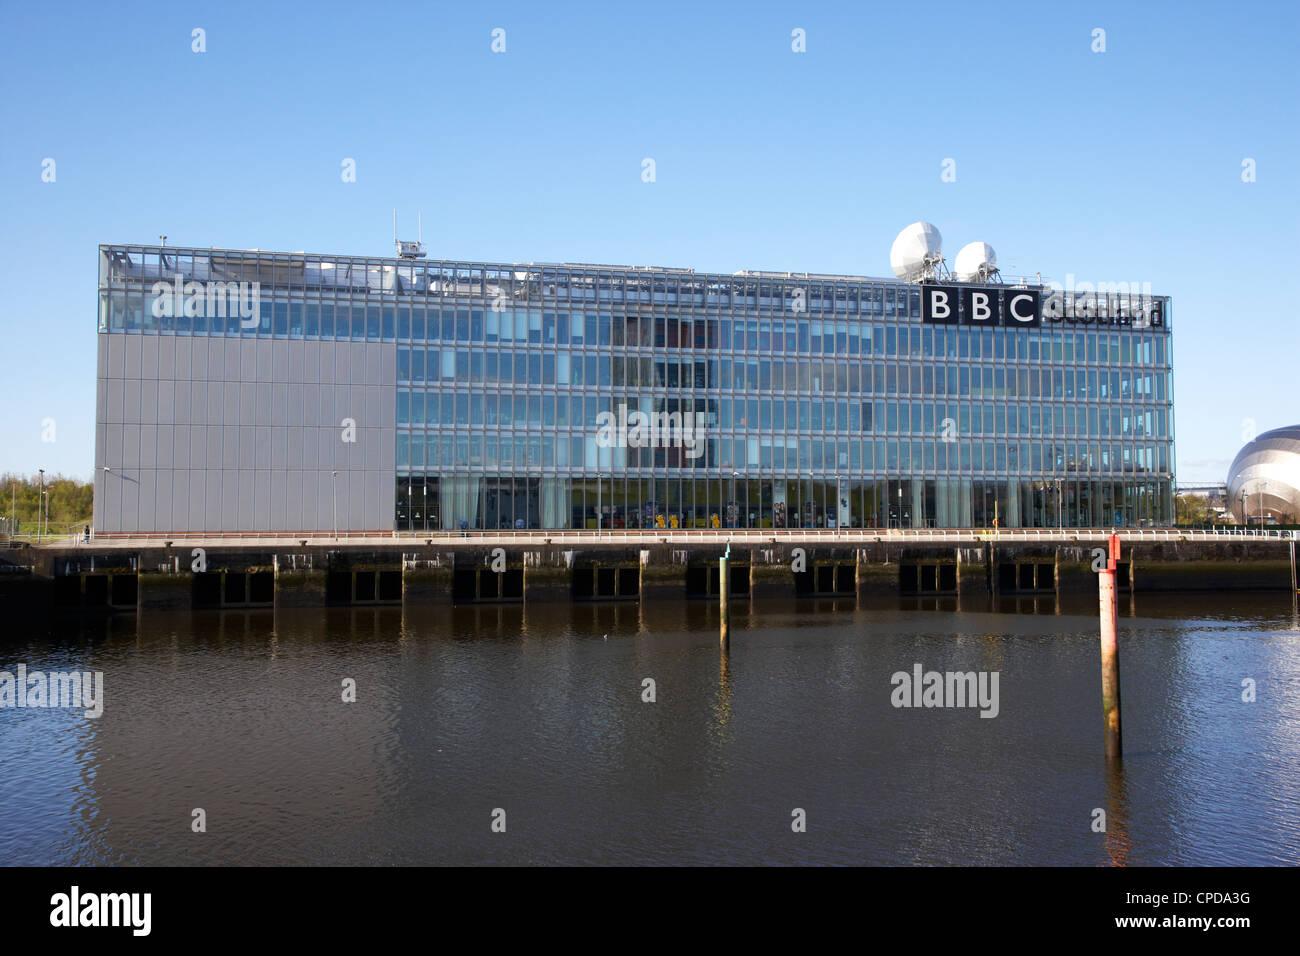 bbc scotland hq stock photos  u0026 bbc scotland hq stock